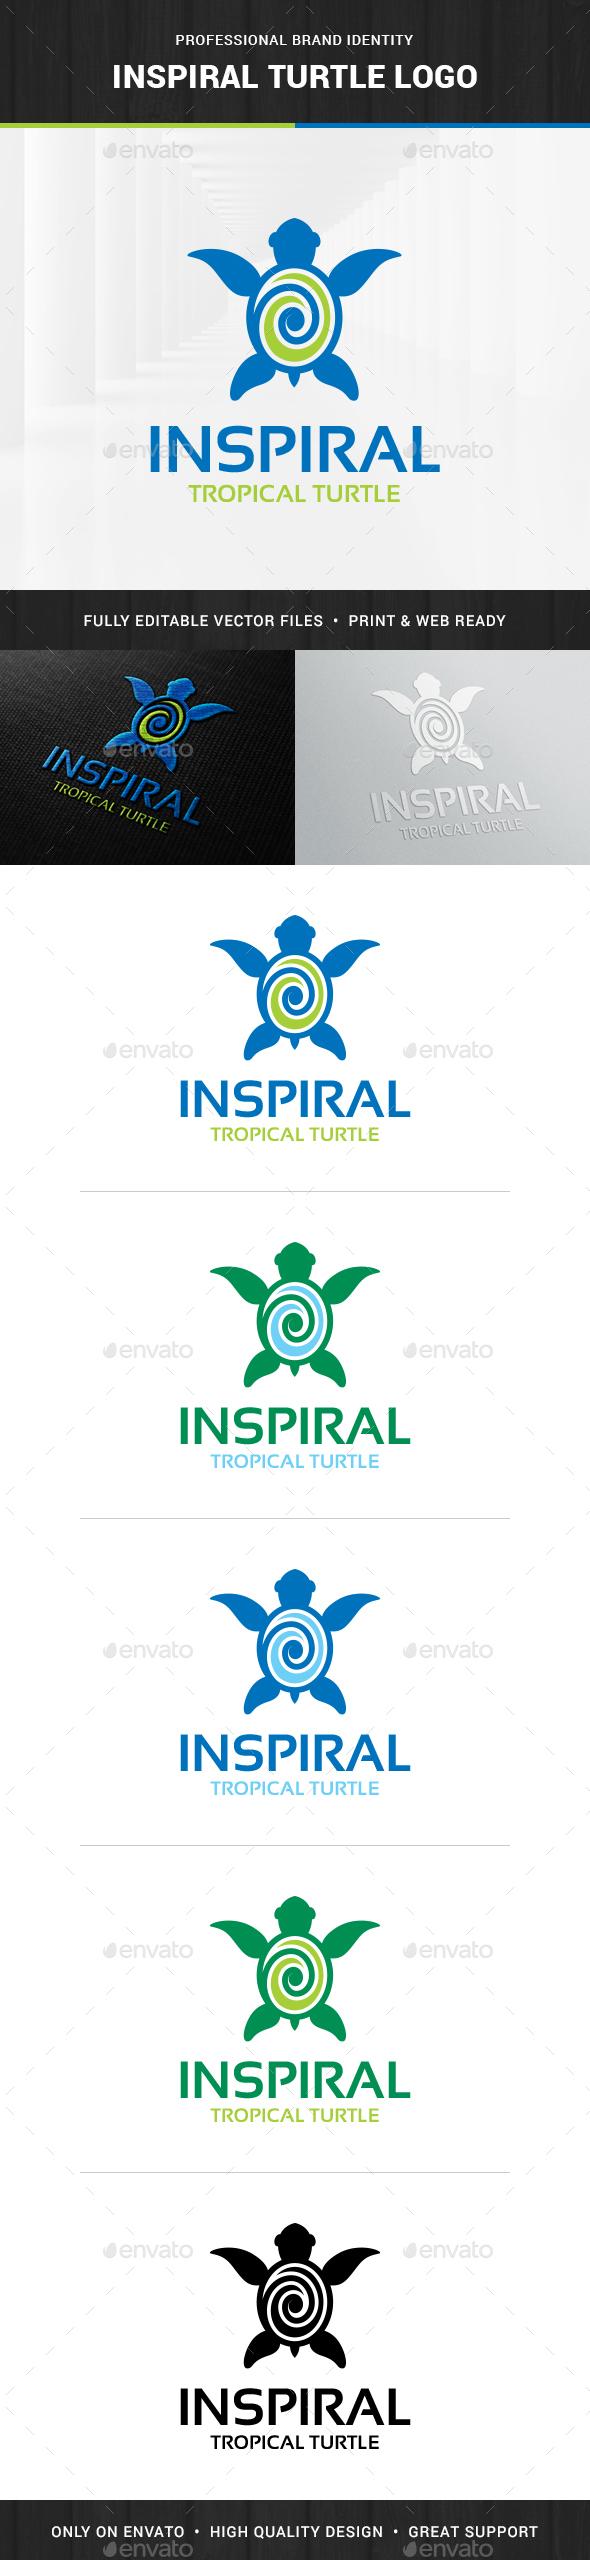 Inspiral - Turtle Logo Template